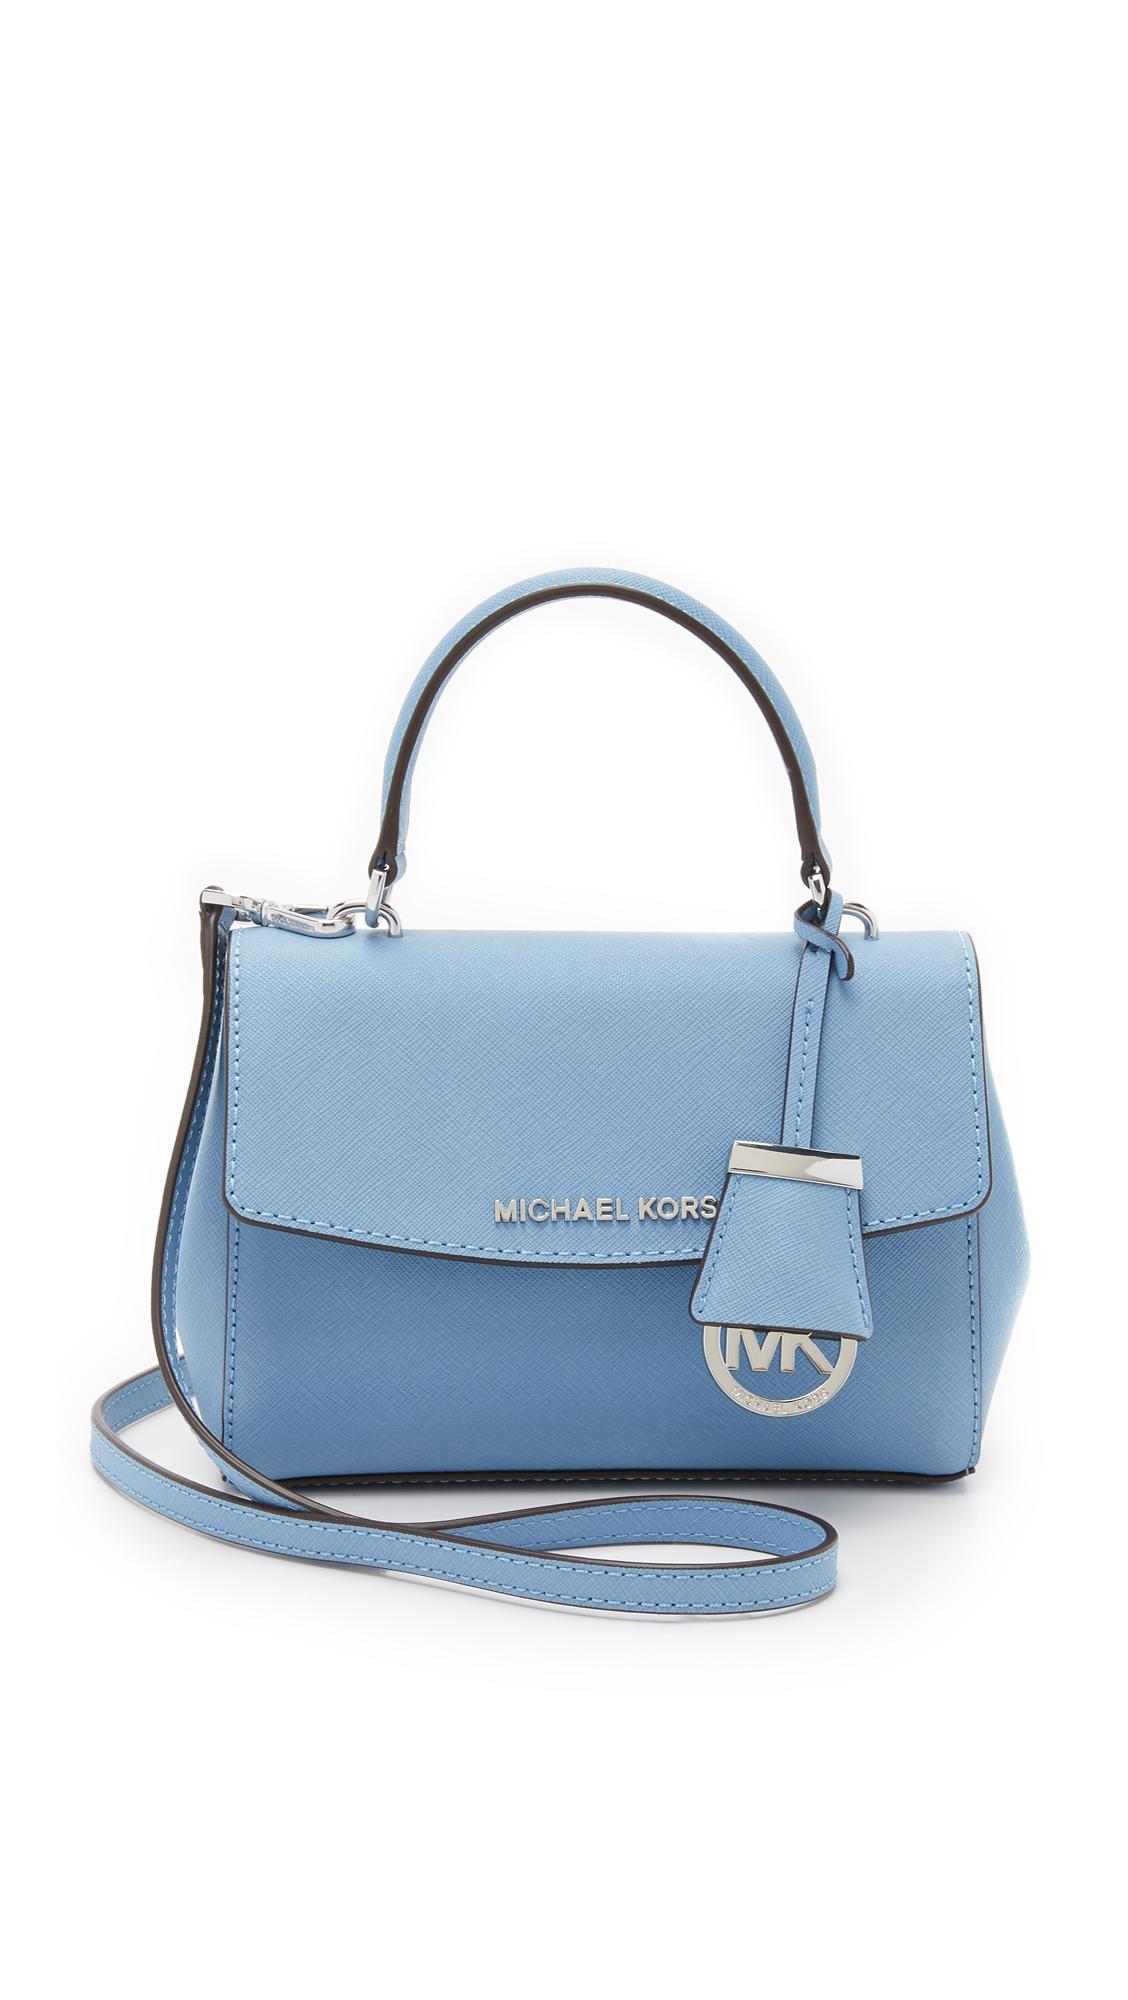 01abbabbd336 Lyst - MICHAEL Michael Kors Ava Small Cross Body Bag - Sky in Blue